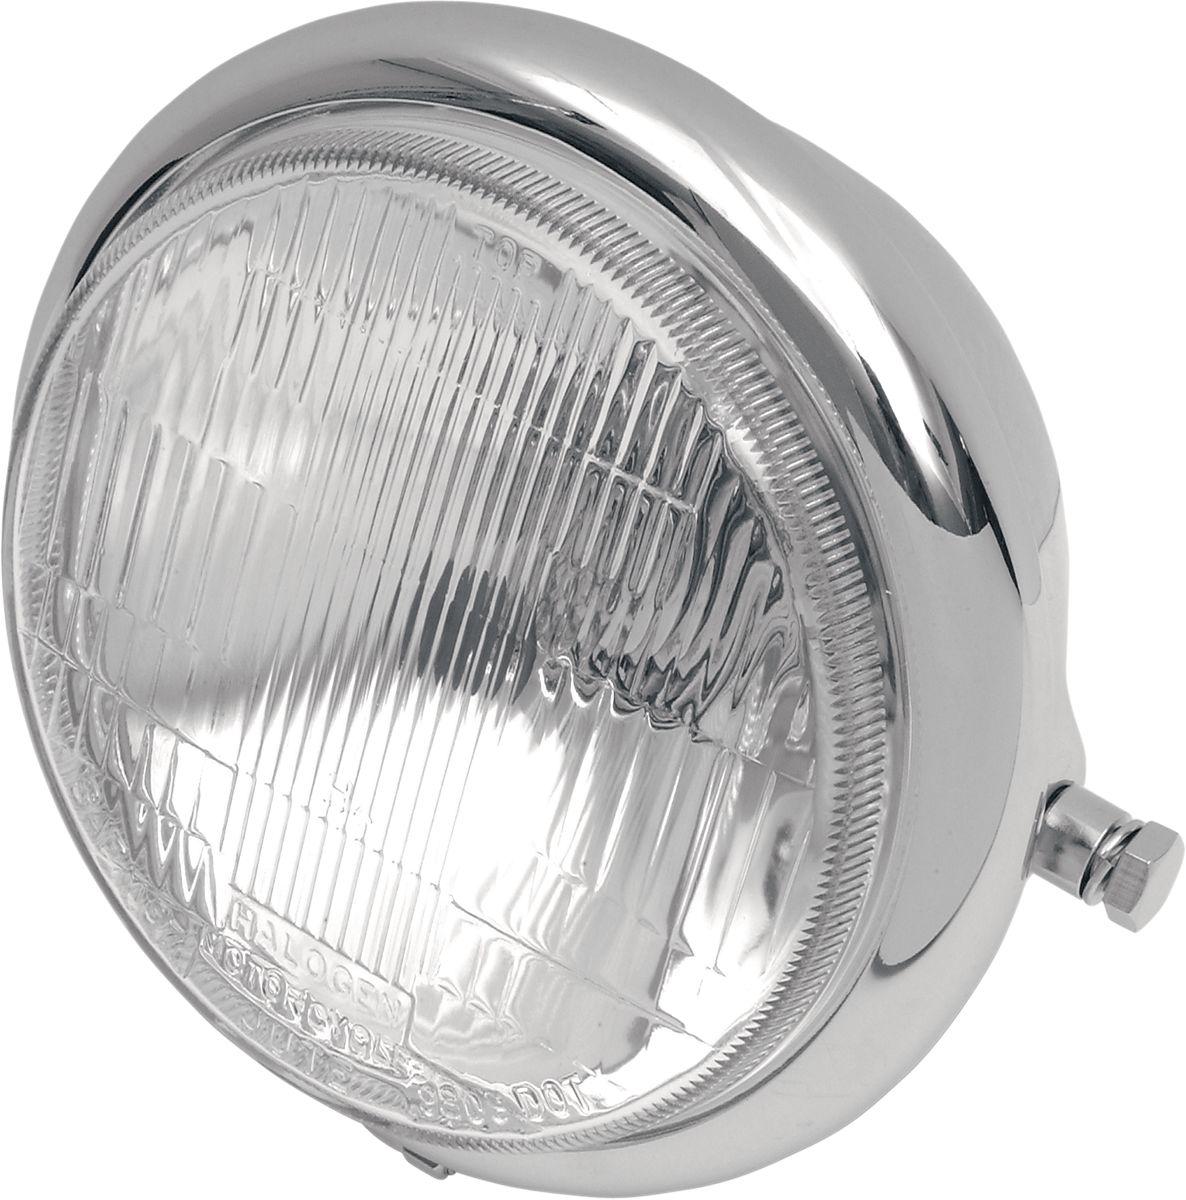 "【Drag Specialties】頭燈/ 5 3/4"" 側安裝W/H4用 【5 3/4""H-LITE SIDE MT.W/H4 [DS-280036]】 - 「Webike-摩托百貨」"